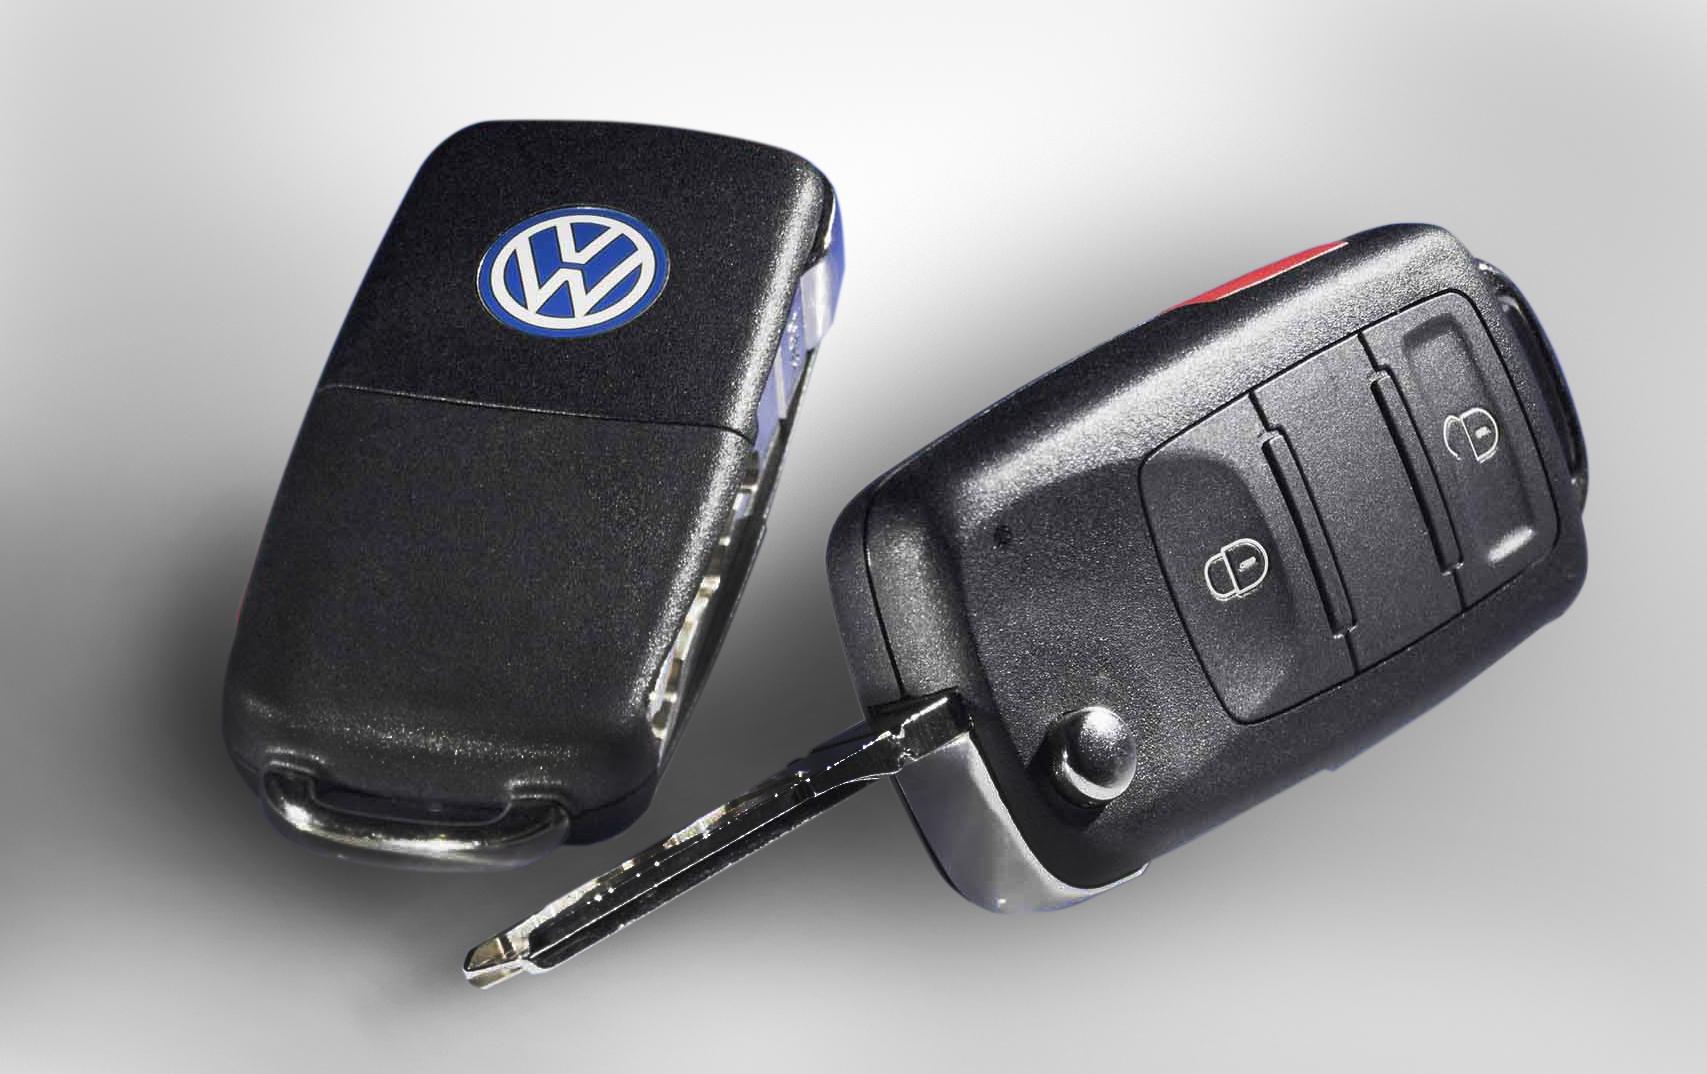 Lock Pick Key >> VW Key Fob by Daniel Woods at Coroflot.com